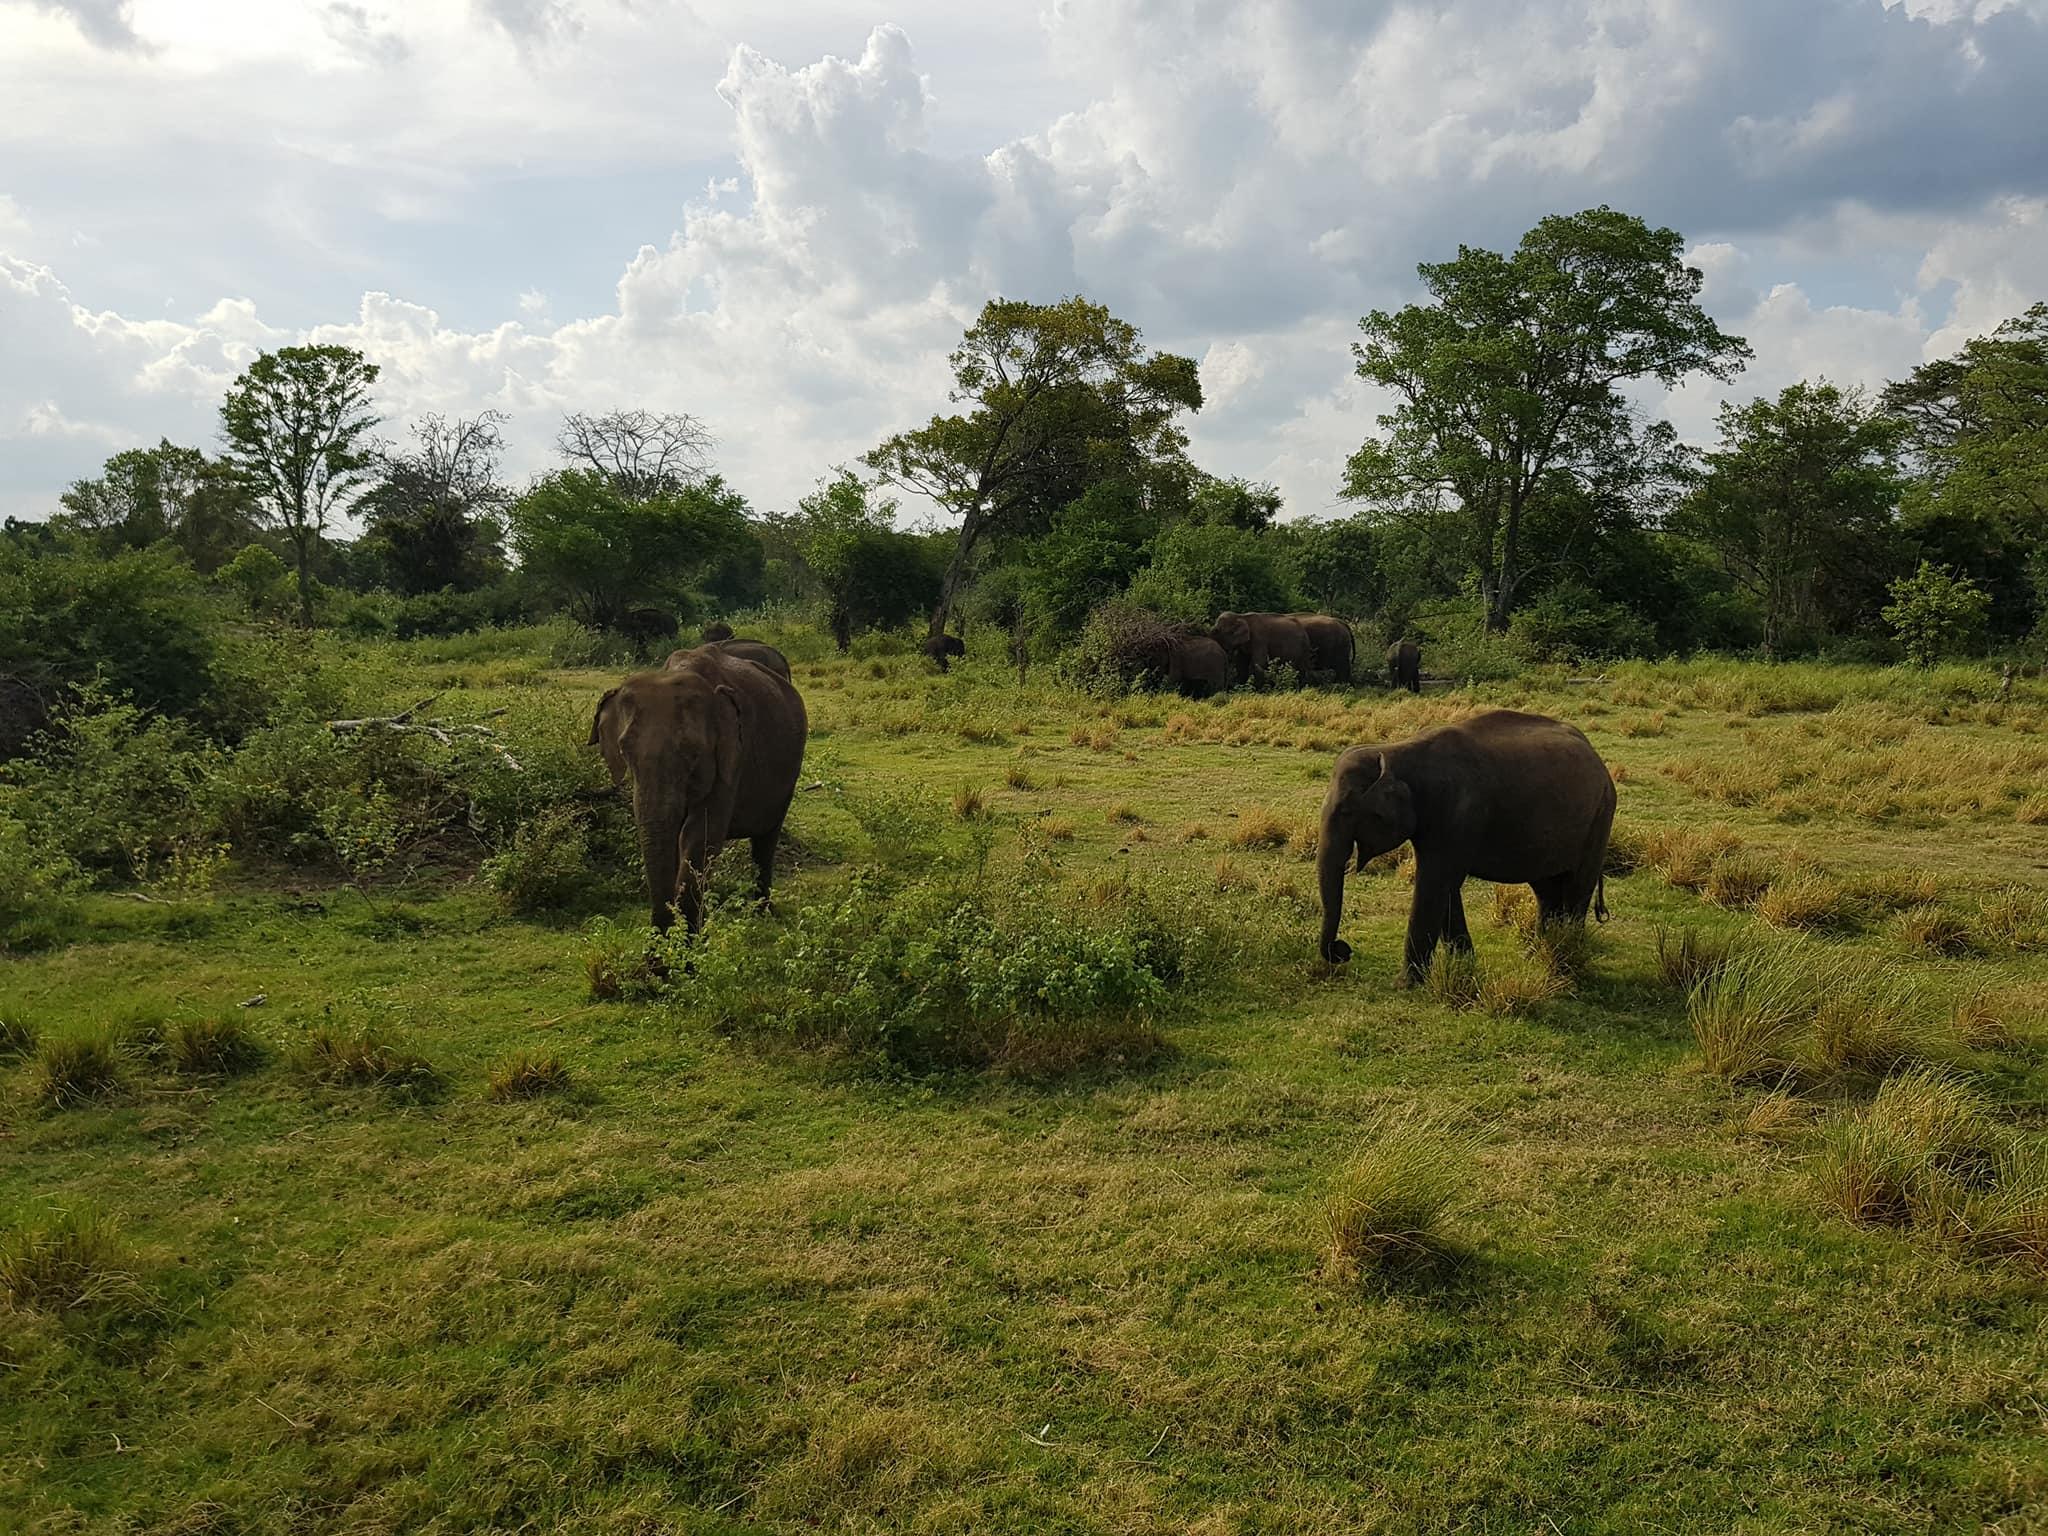 invite-to-paradise-sri-lanka-maldives-holiday-honeymoon-specialists-customer-guest-feedback-zane-lisa-butcher-wild-elephant-wildlife-safari-2.jpg